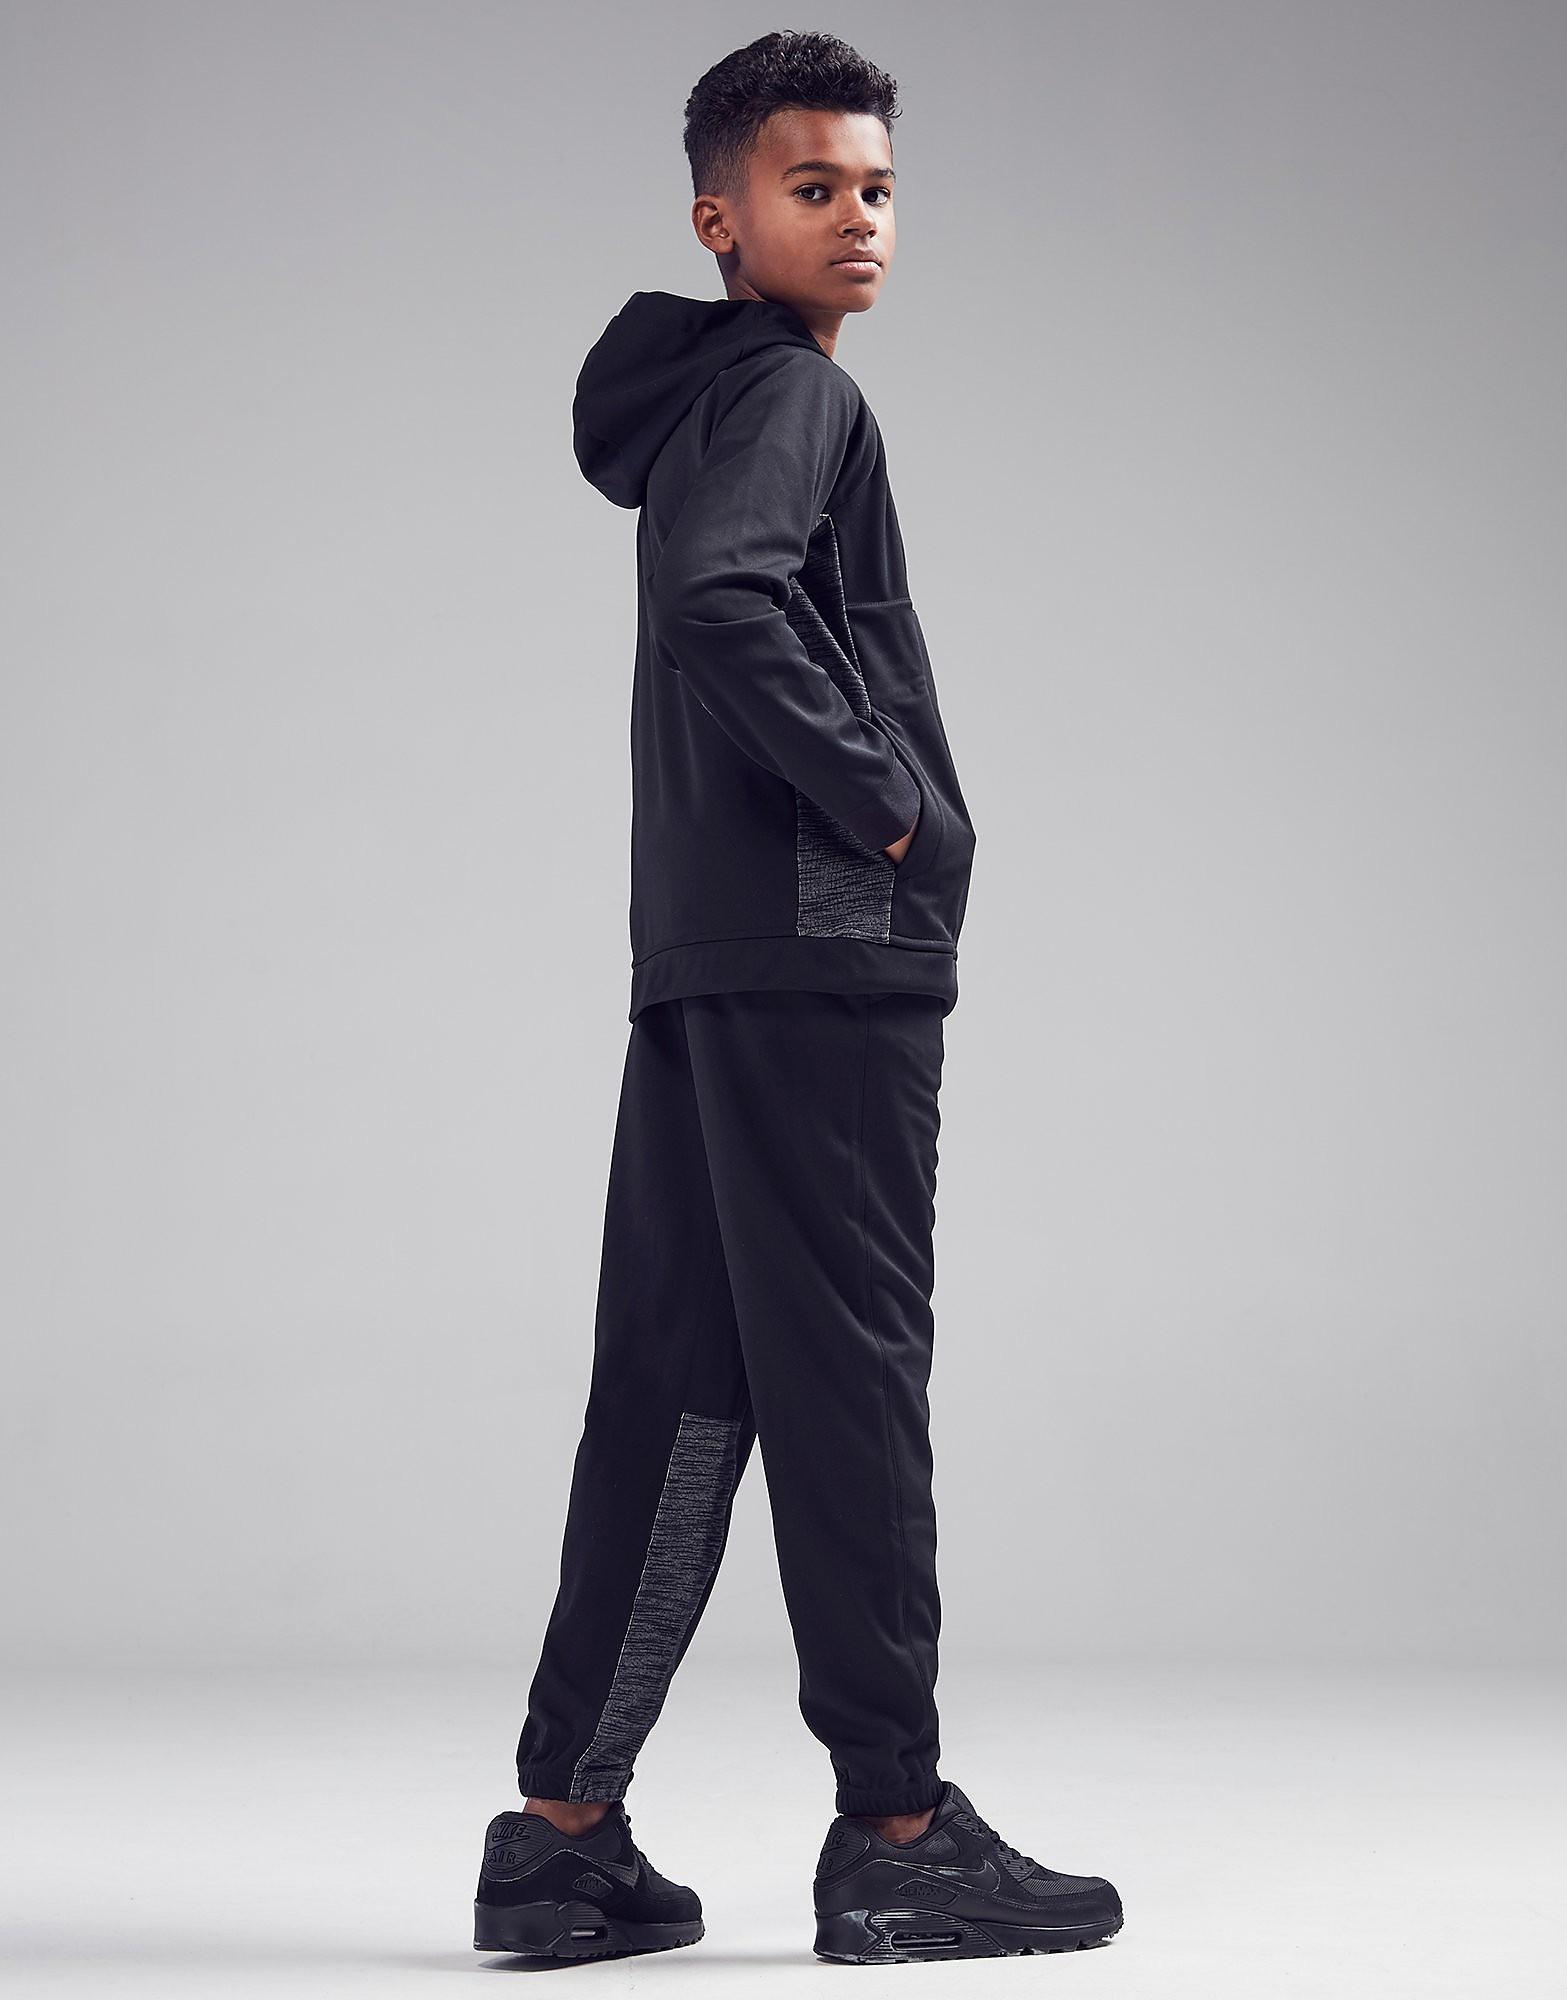 Nike Advanced Fleece Suit Junior